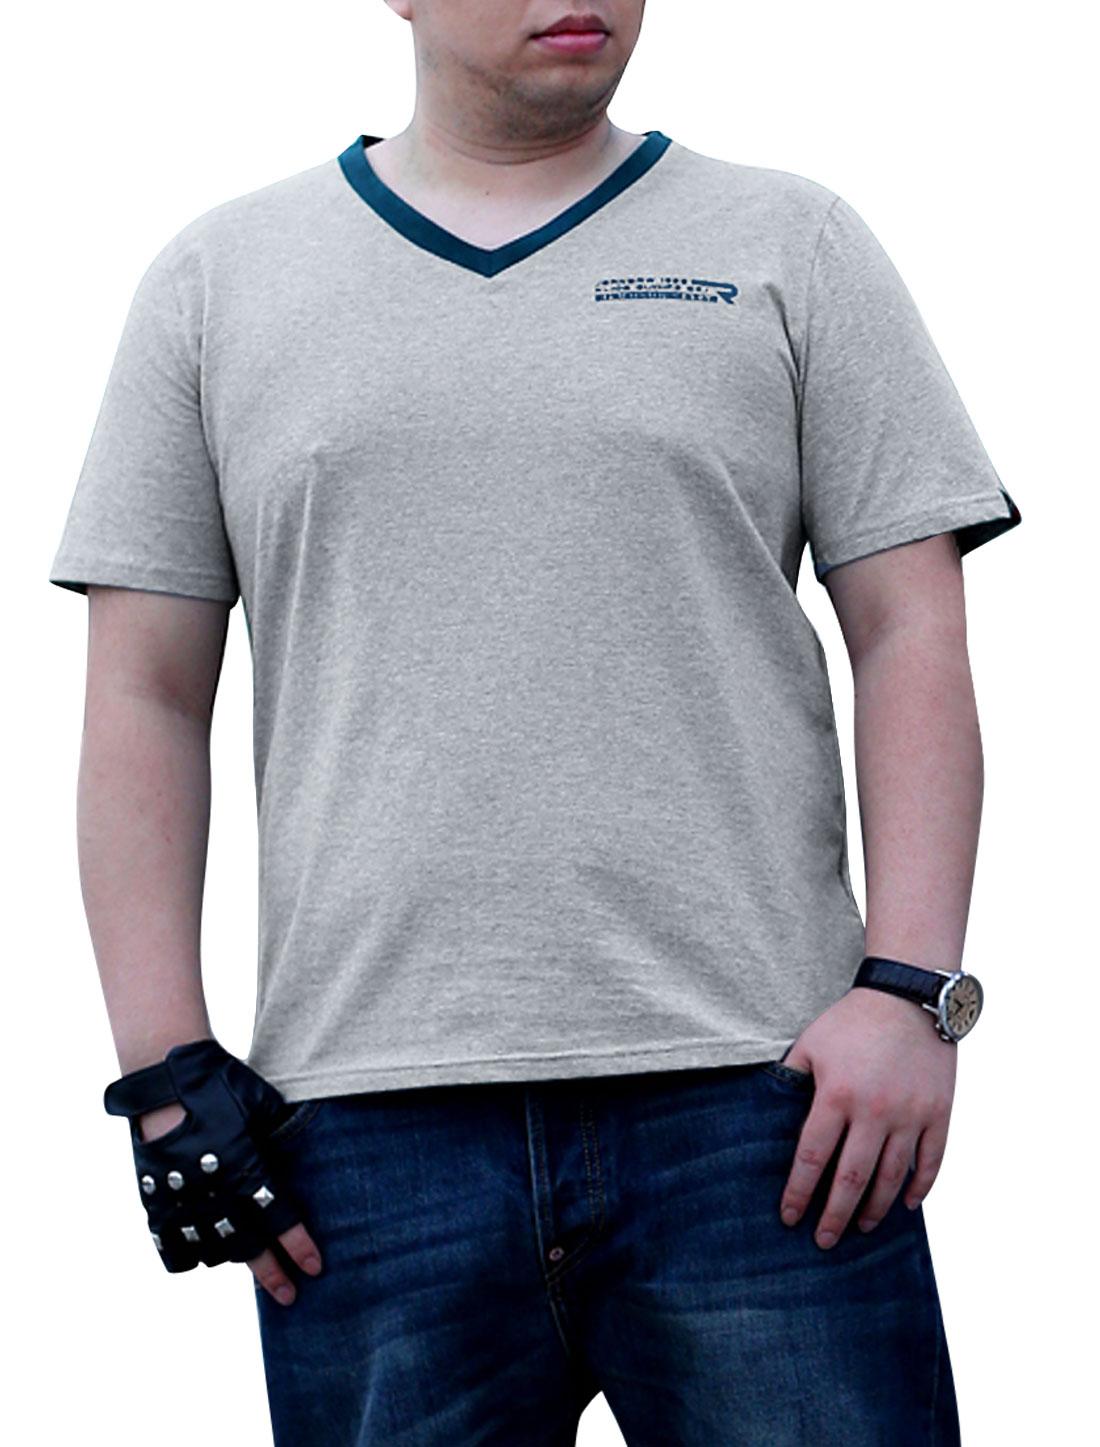 Men V Neckline Design Slipover Fashion T-Shirt Light Gray L